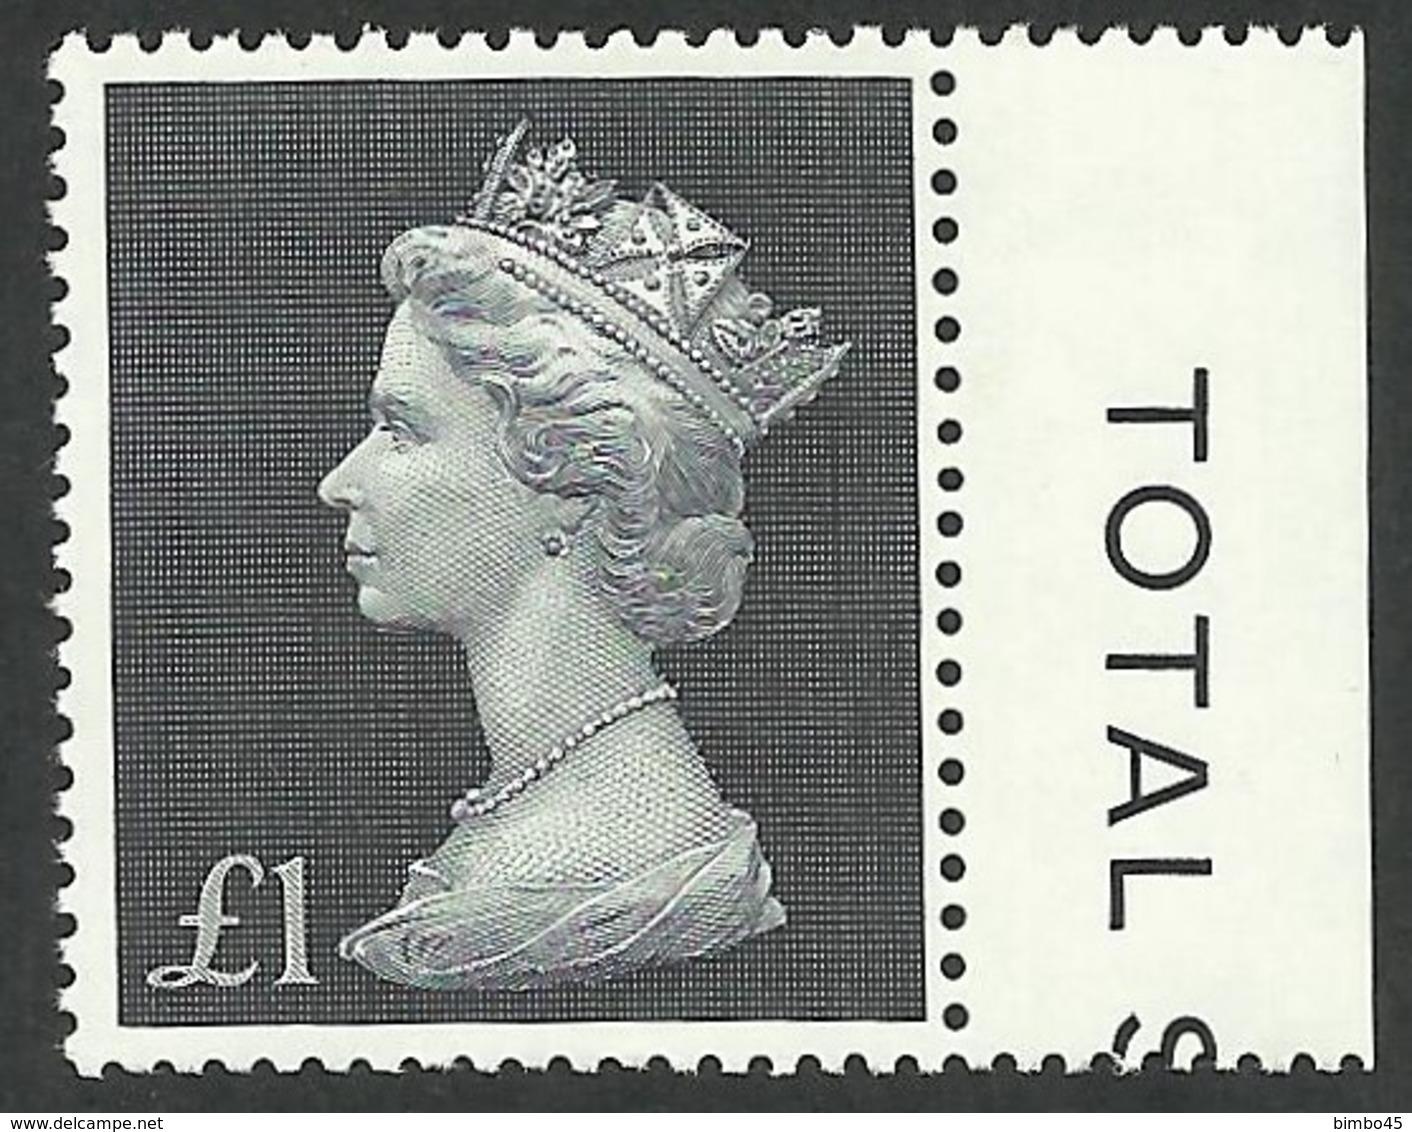 GREAT BRITAIN --1969 MNH - 1952-.... (Elisabetta II)